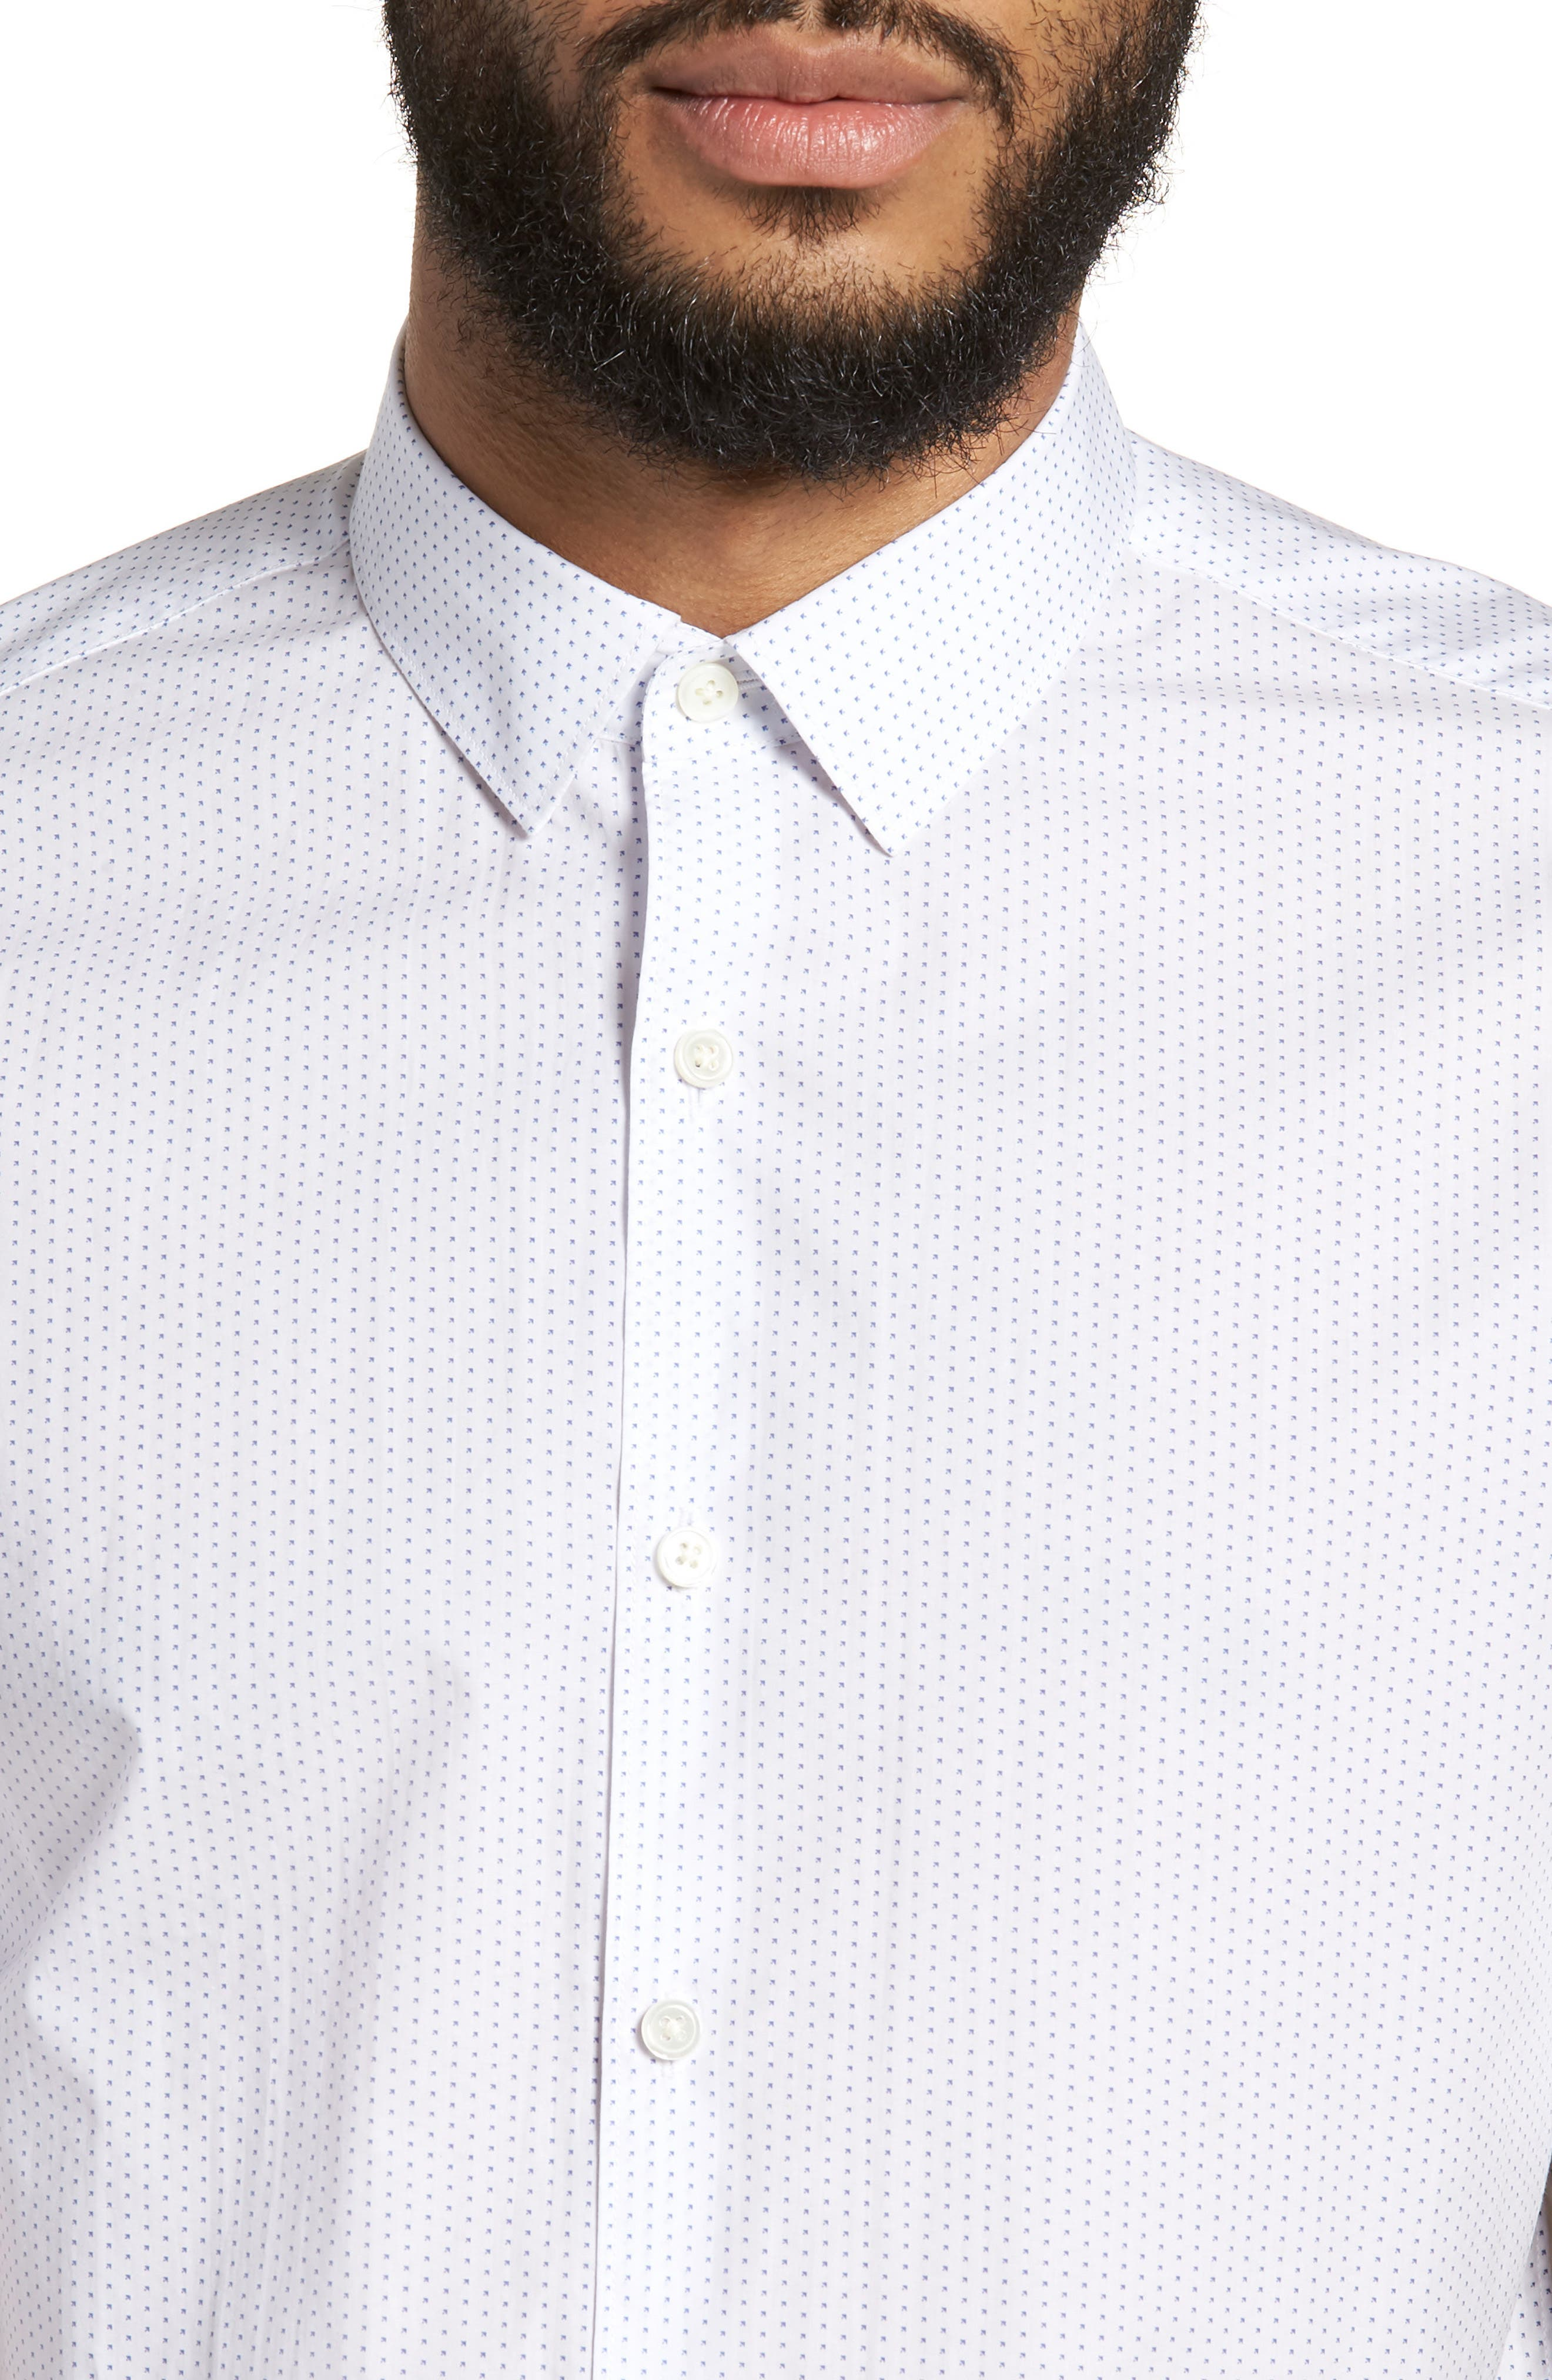 Murrary Trim Fit Dot Short Sleeve Sport Shirt,                             Alternate thumbnail 4, color,                             100